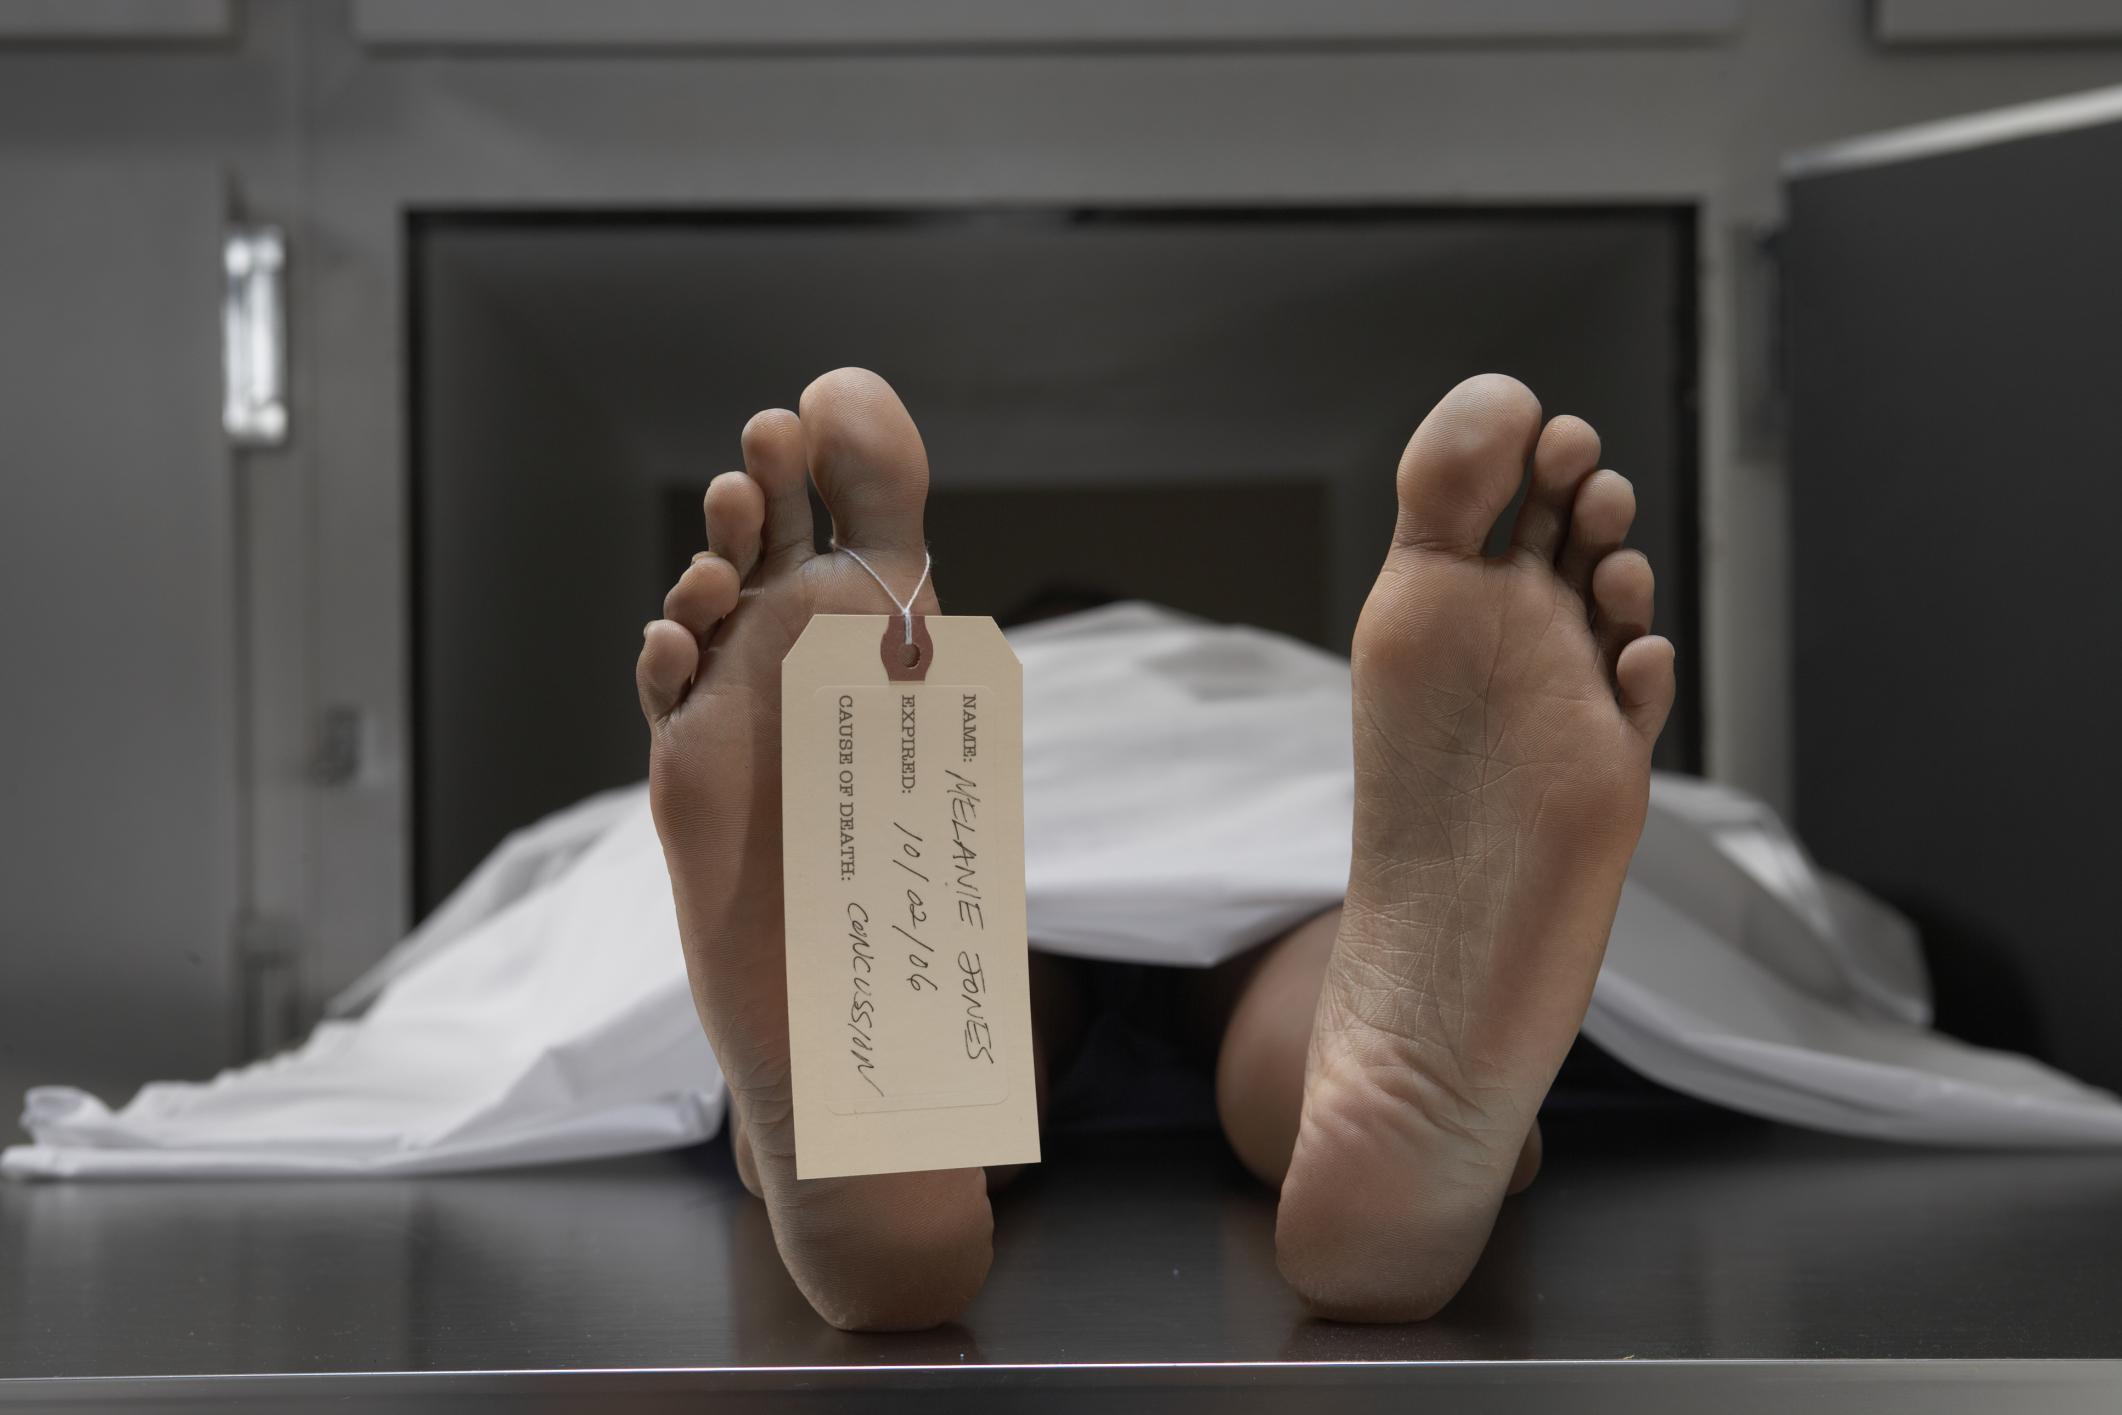 Dead body table